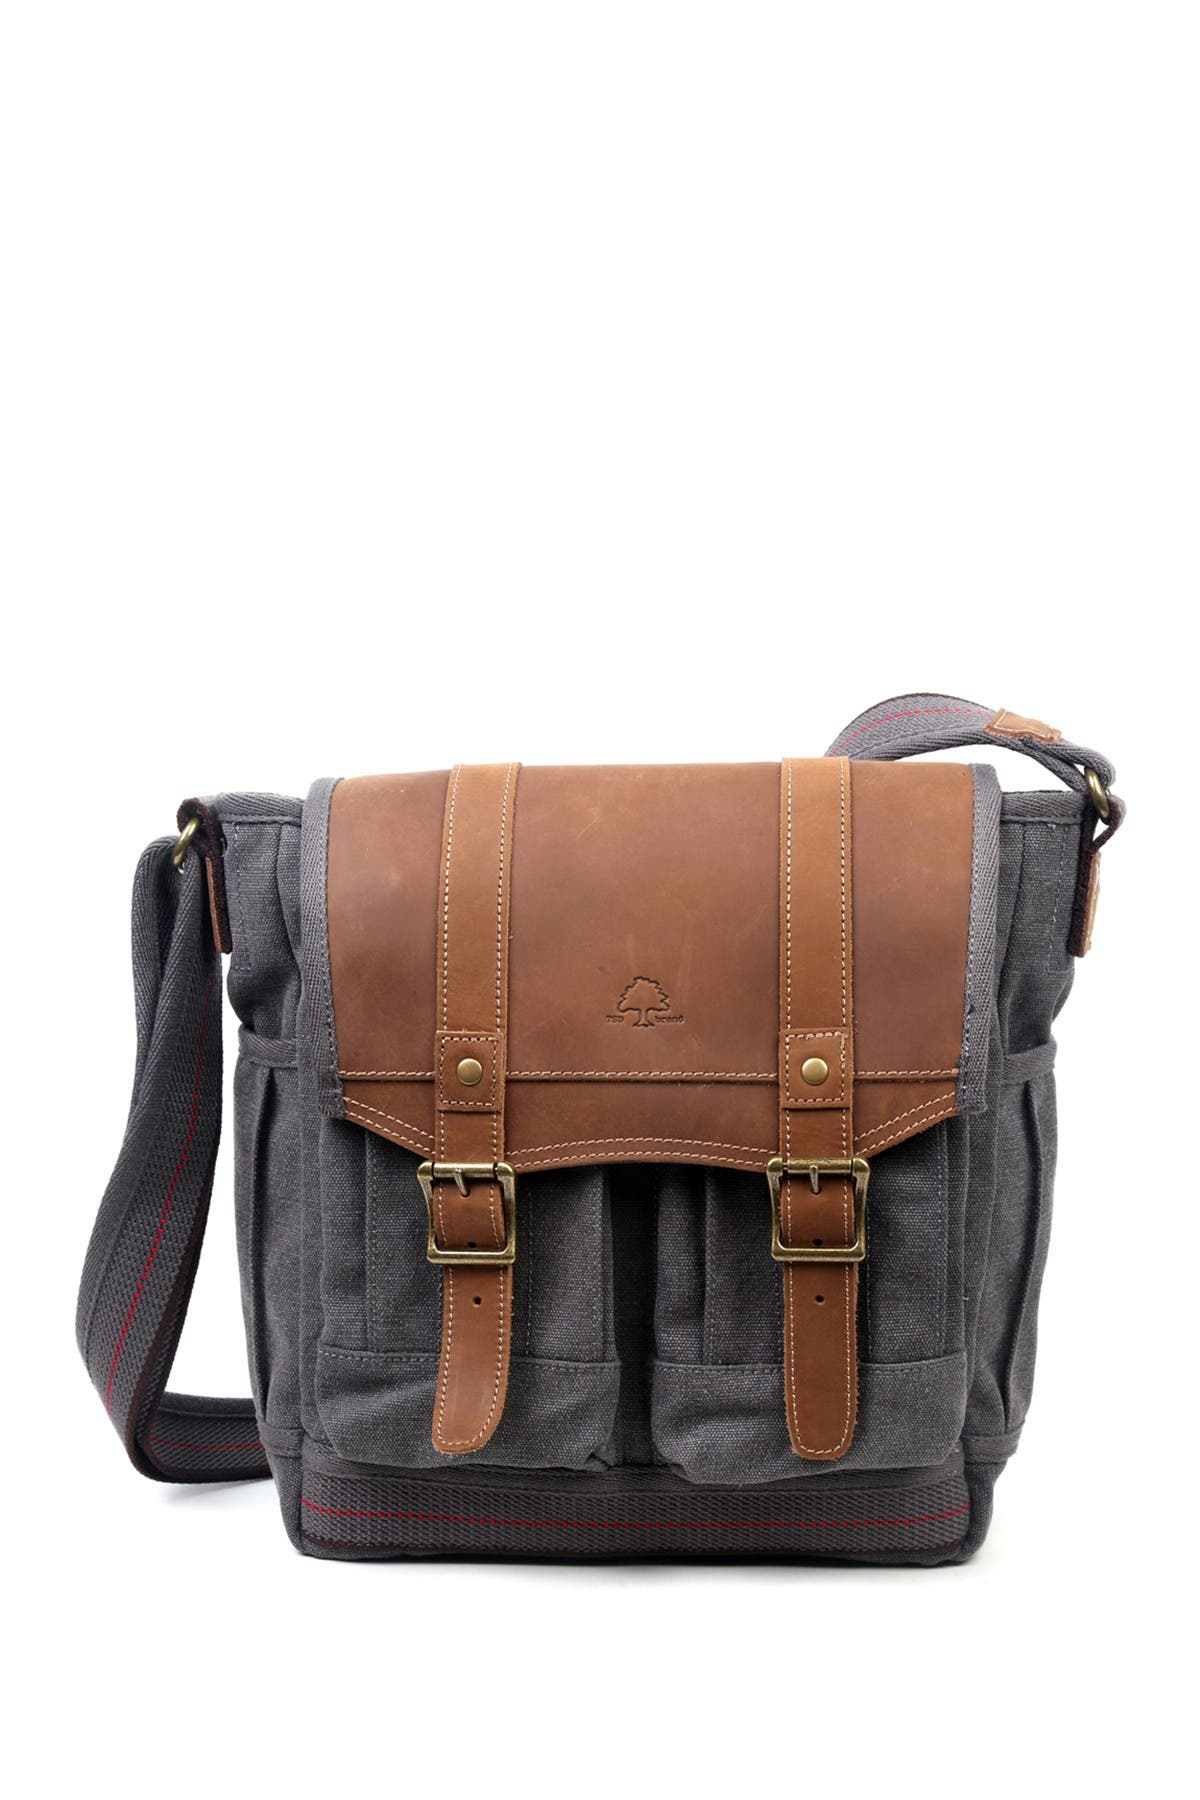 Image of TSD Turtle Ridge 4-Pocket Canvas Crossbody Bag